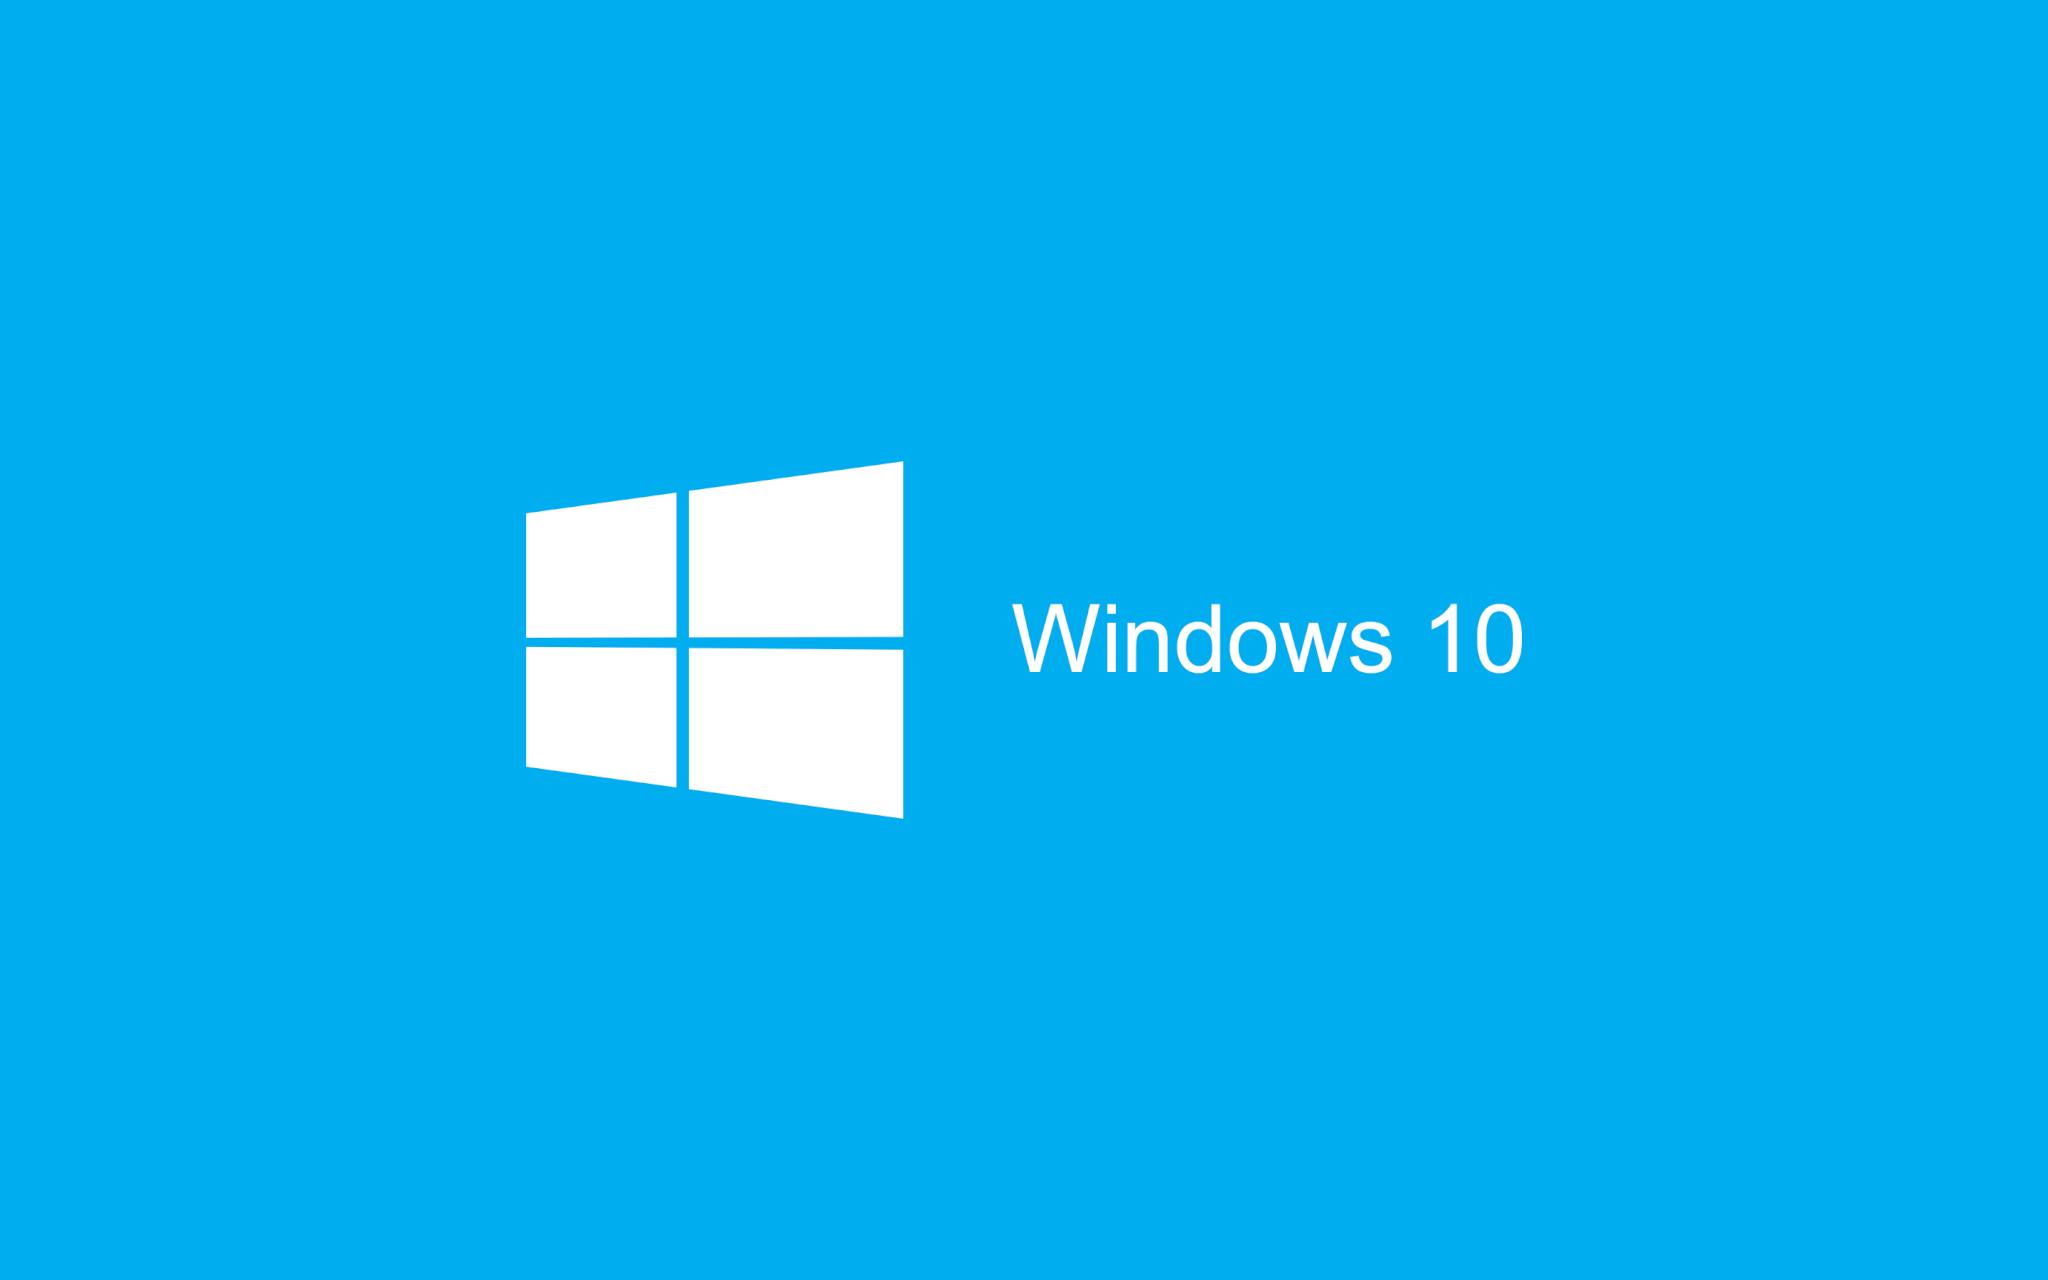 blue wallpaper windows 10 hd 2880x1800 - Windows 10 já tem data de lançamento